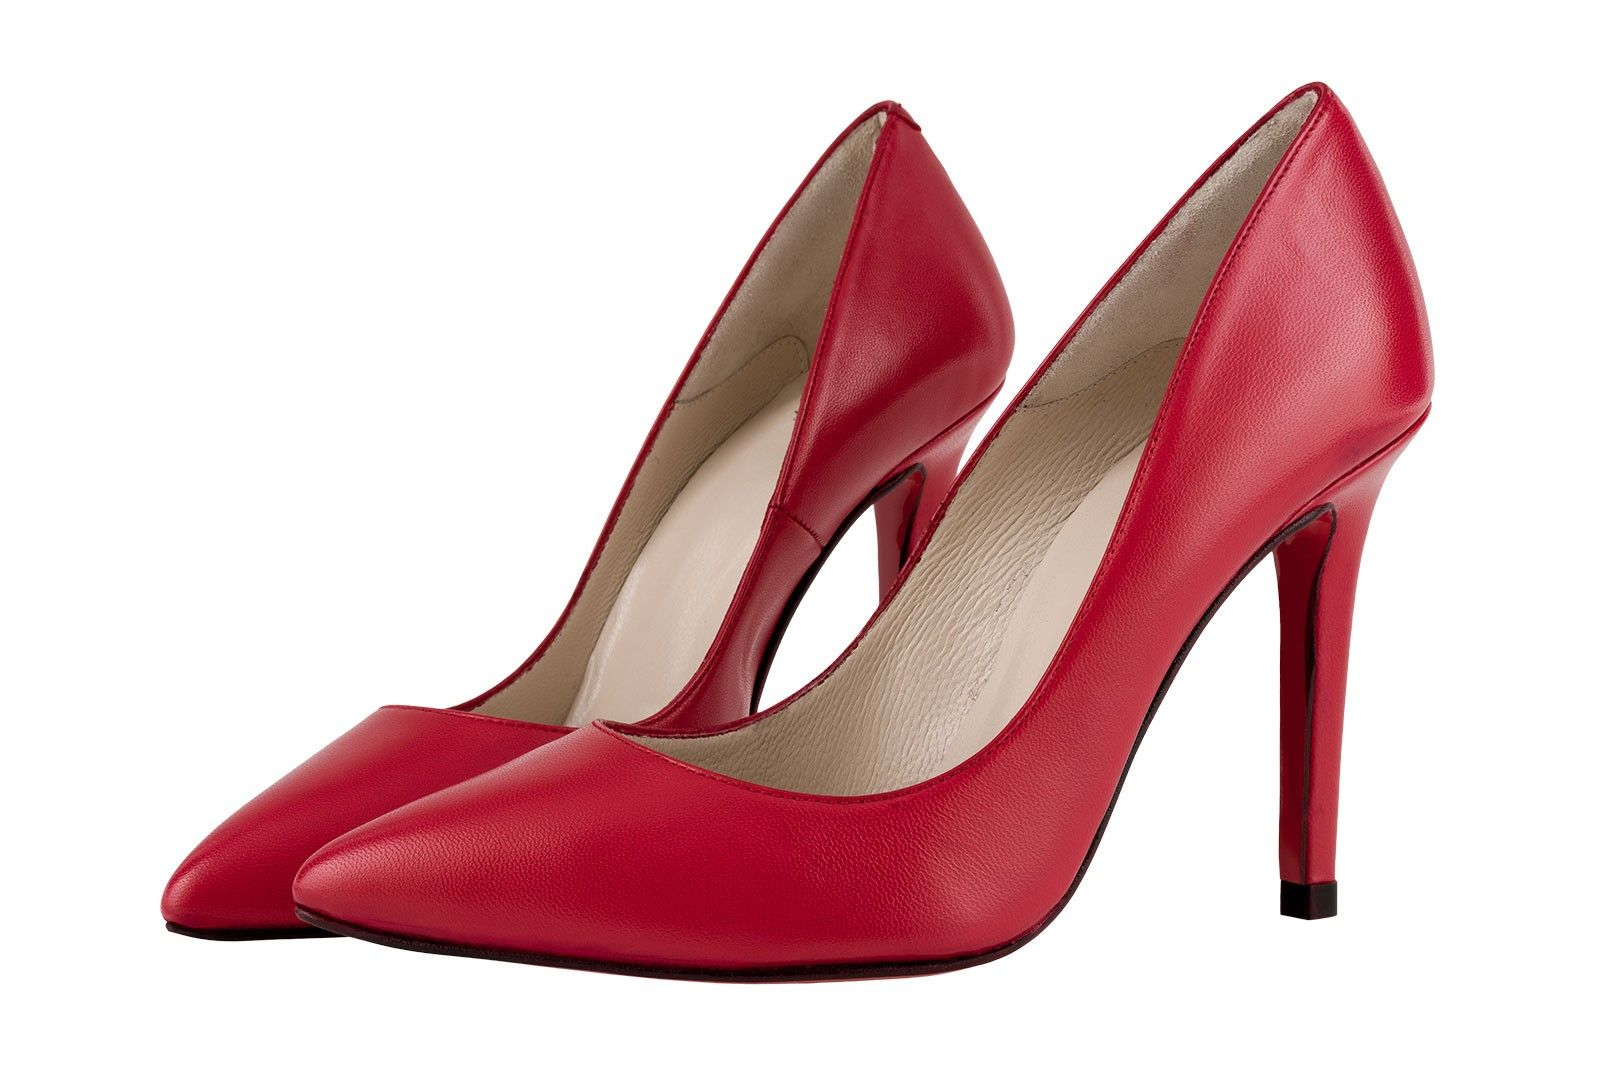 DAMA modelos ROJOS rojos PARA zapatos MODELOS ZAPATOS modelosdezapatos DE IxpgwUU1q